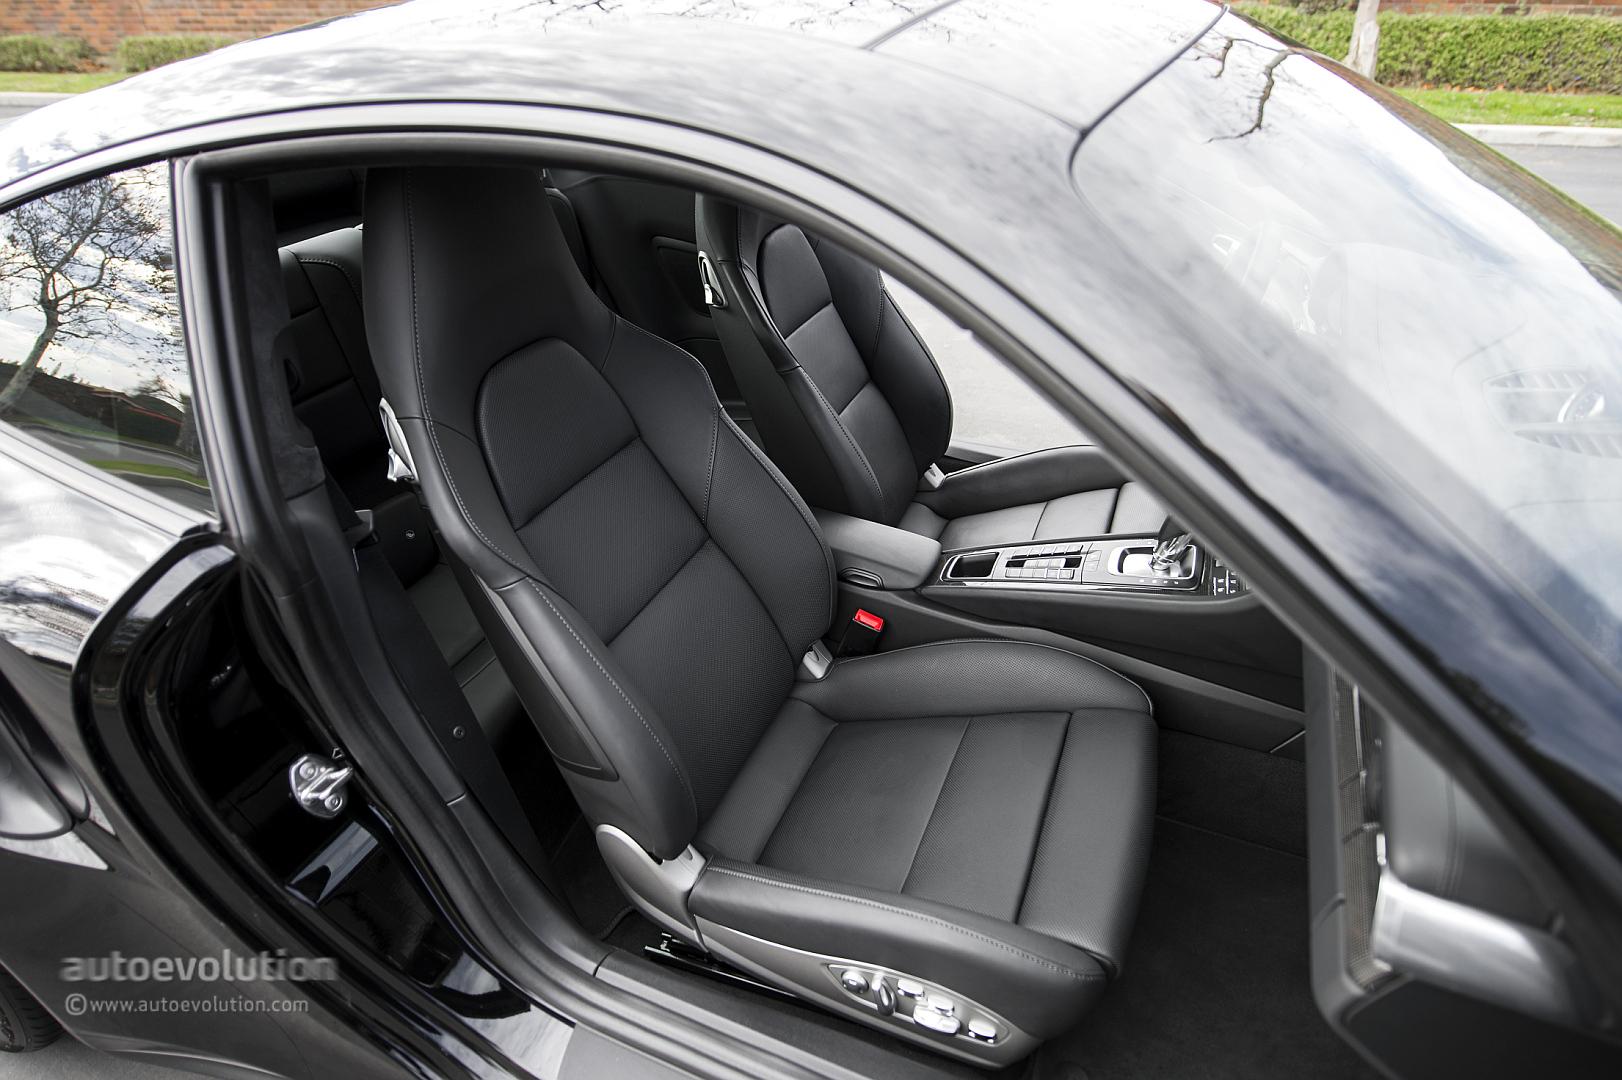 2014 Porsche 911 Turbo S Review Page 3 Autoevolution